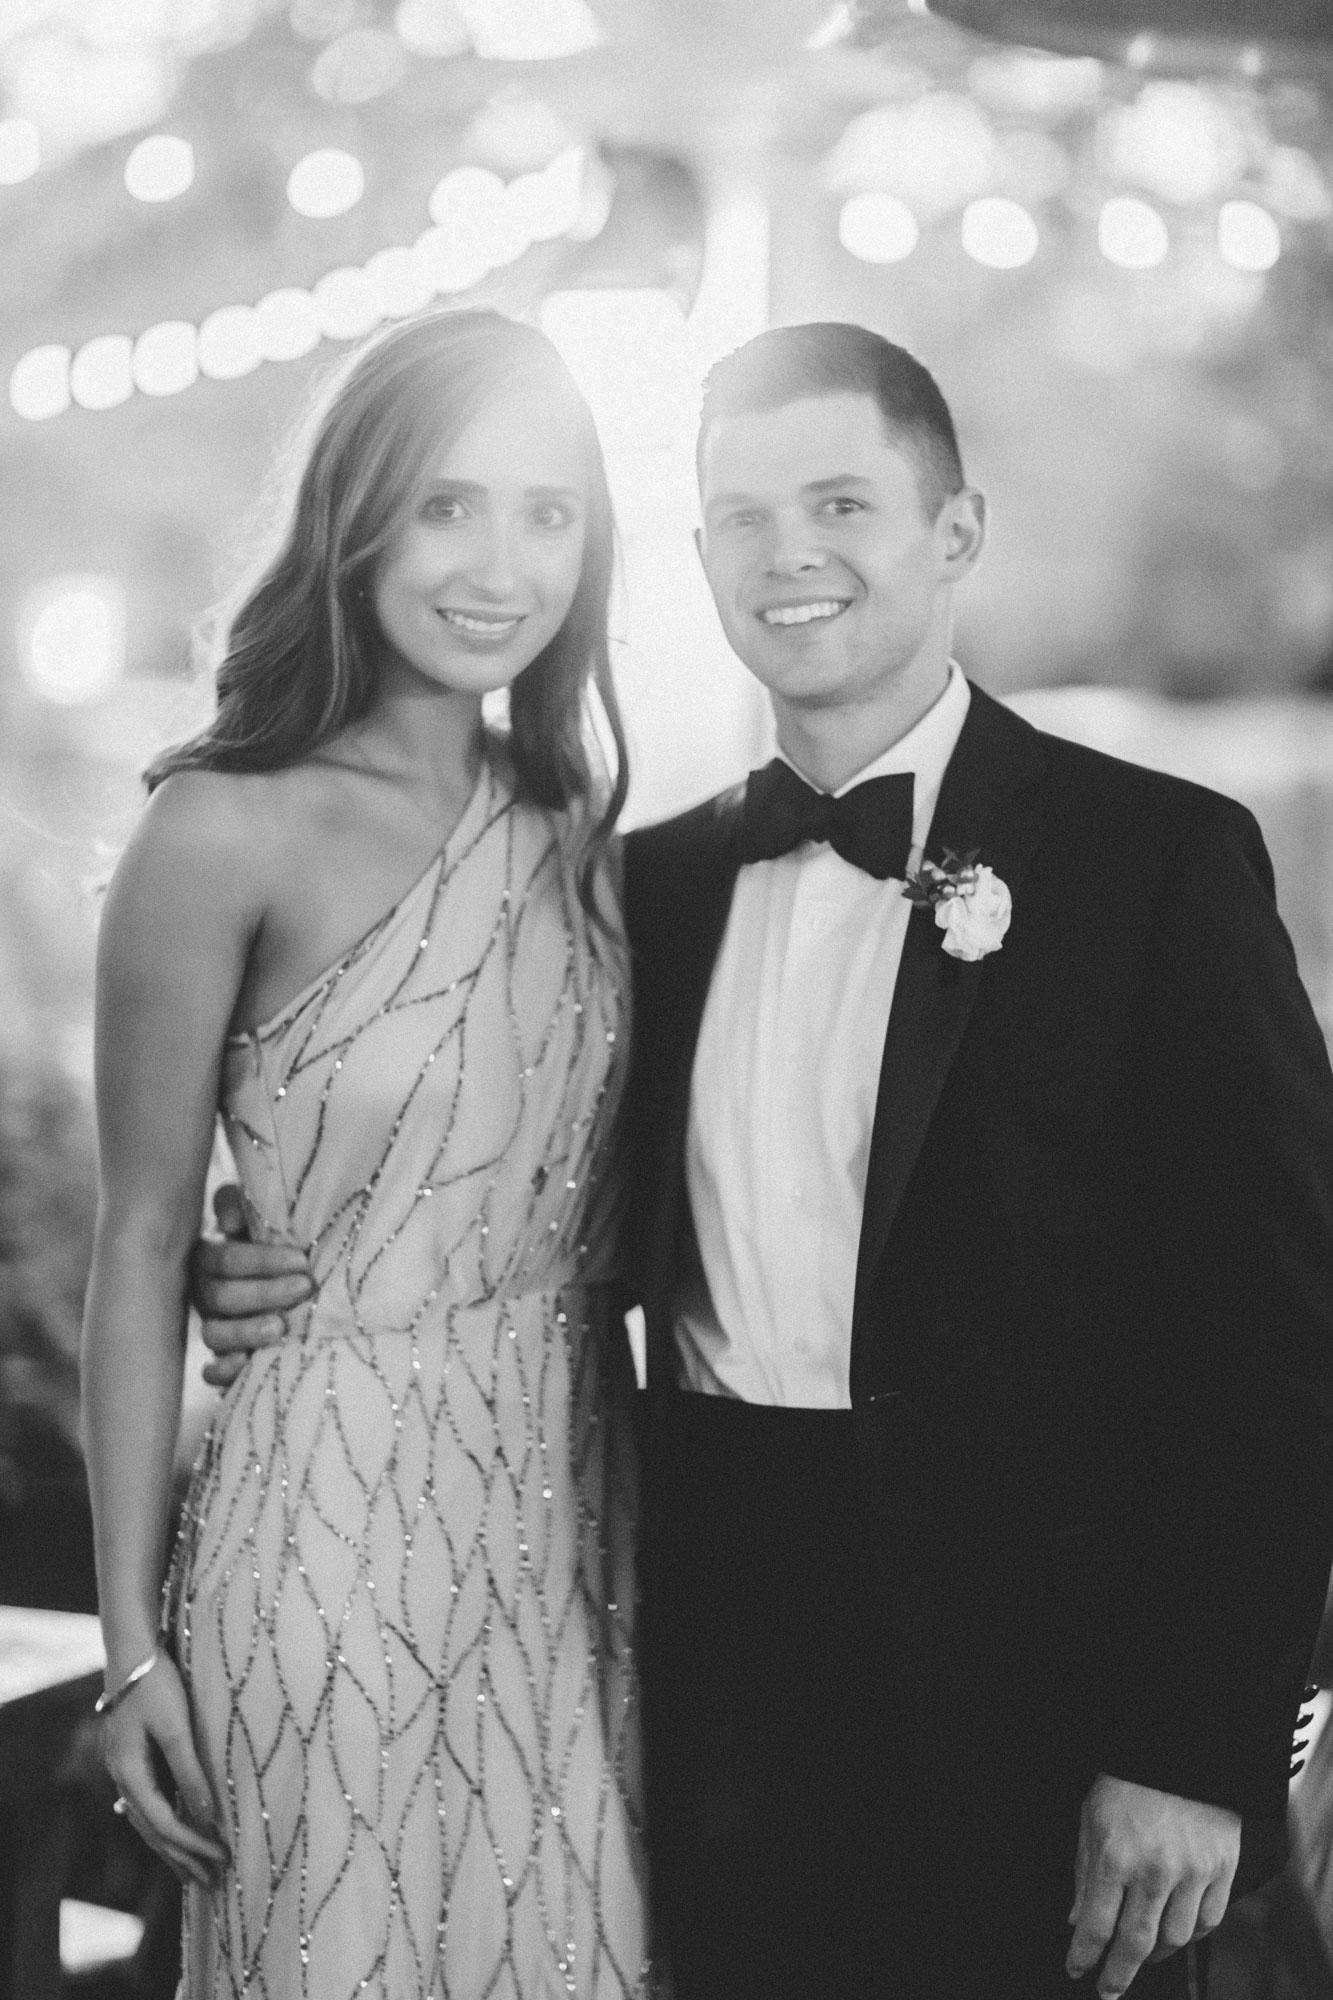 Me & Mr. Jones Wedding, Black Tie Wedding, Adrianna Papell Beaded One Shoulder Gown, Calvin Klein Black Slim Fit Tuxedo